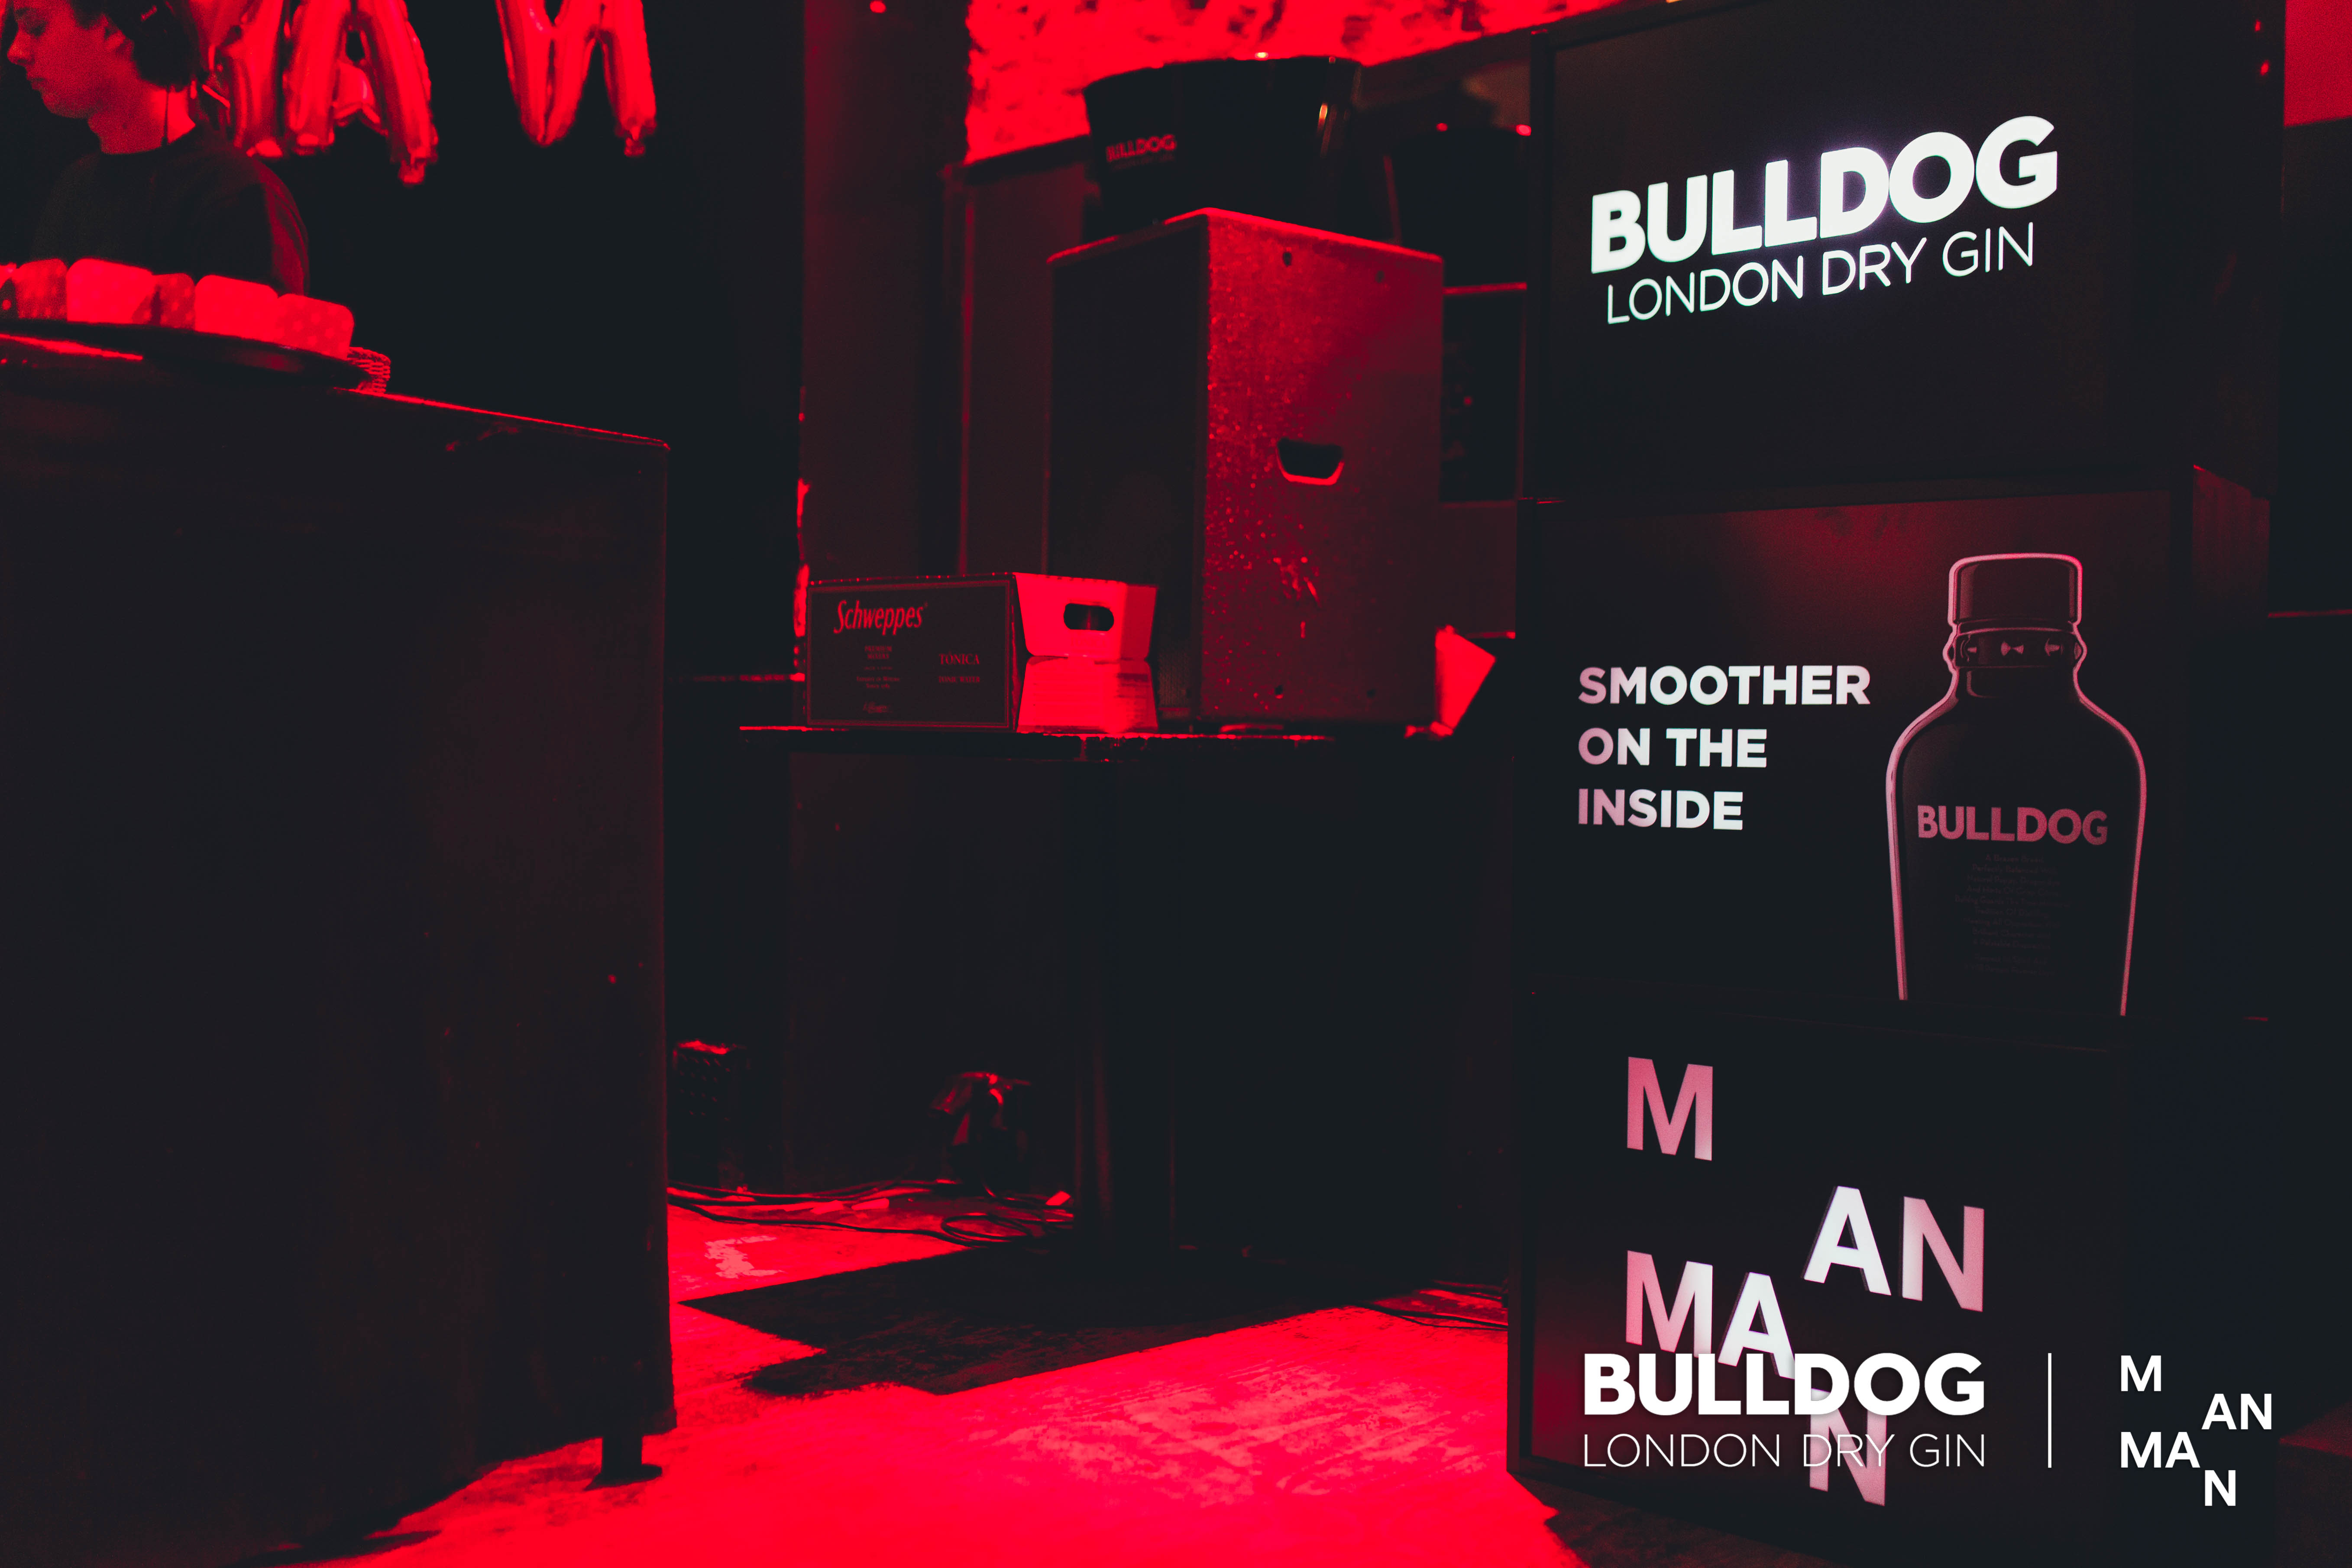 BULLDOG X MANMAN-7